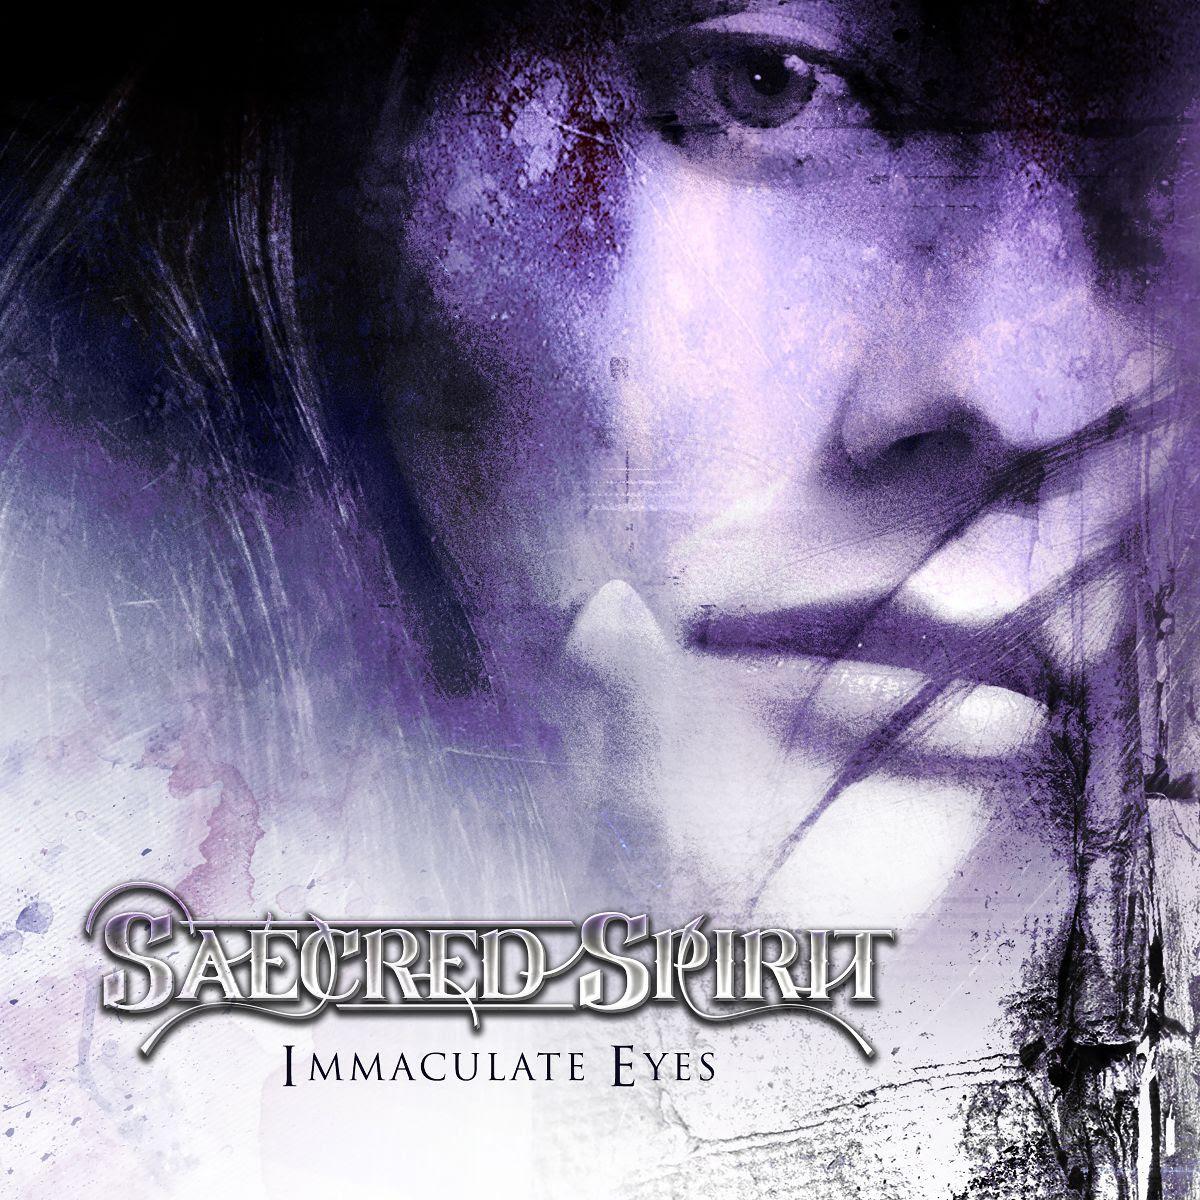 Saecred Spirit hbls